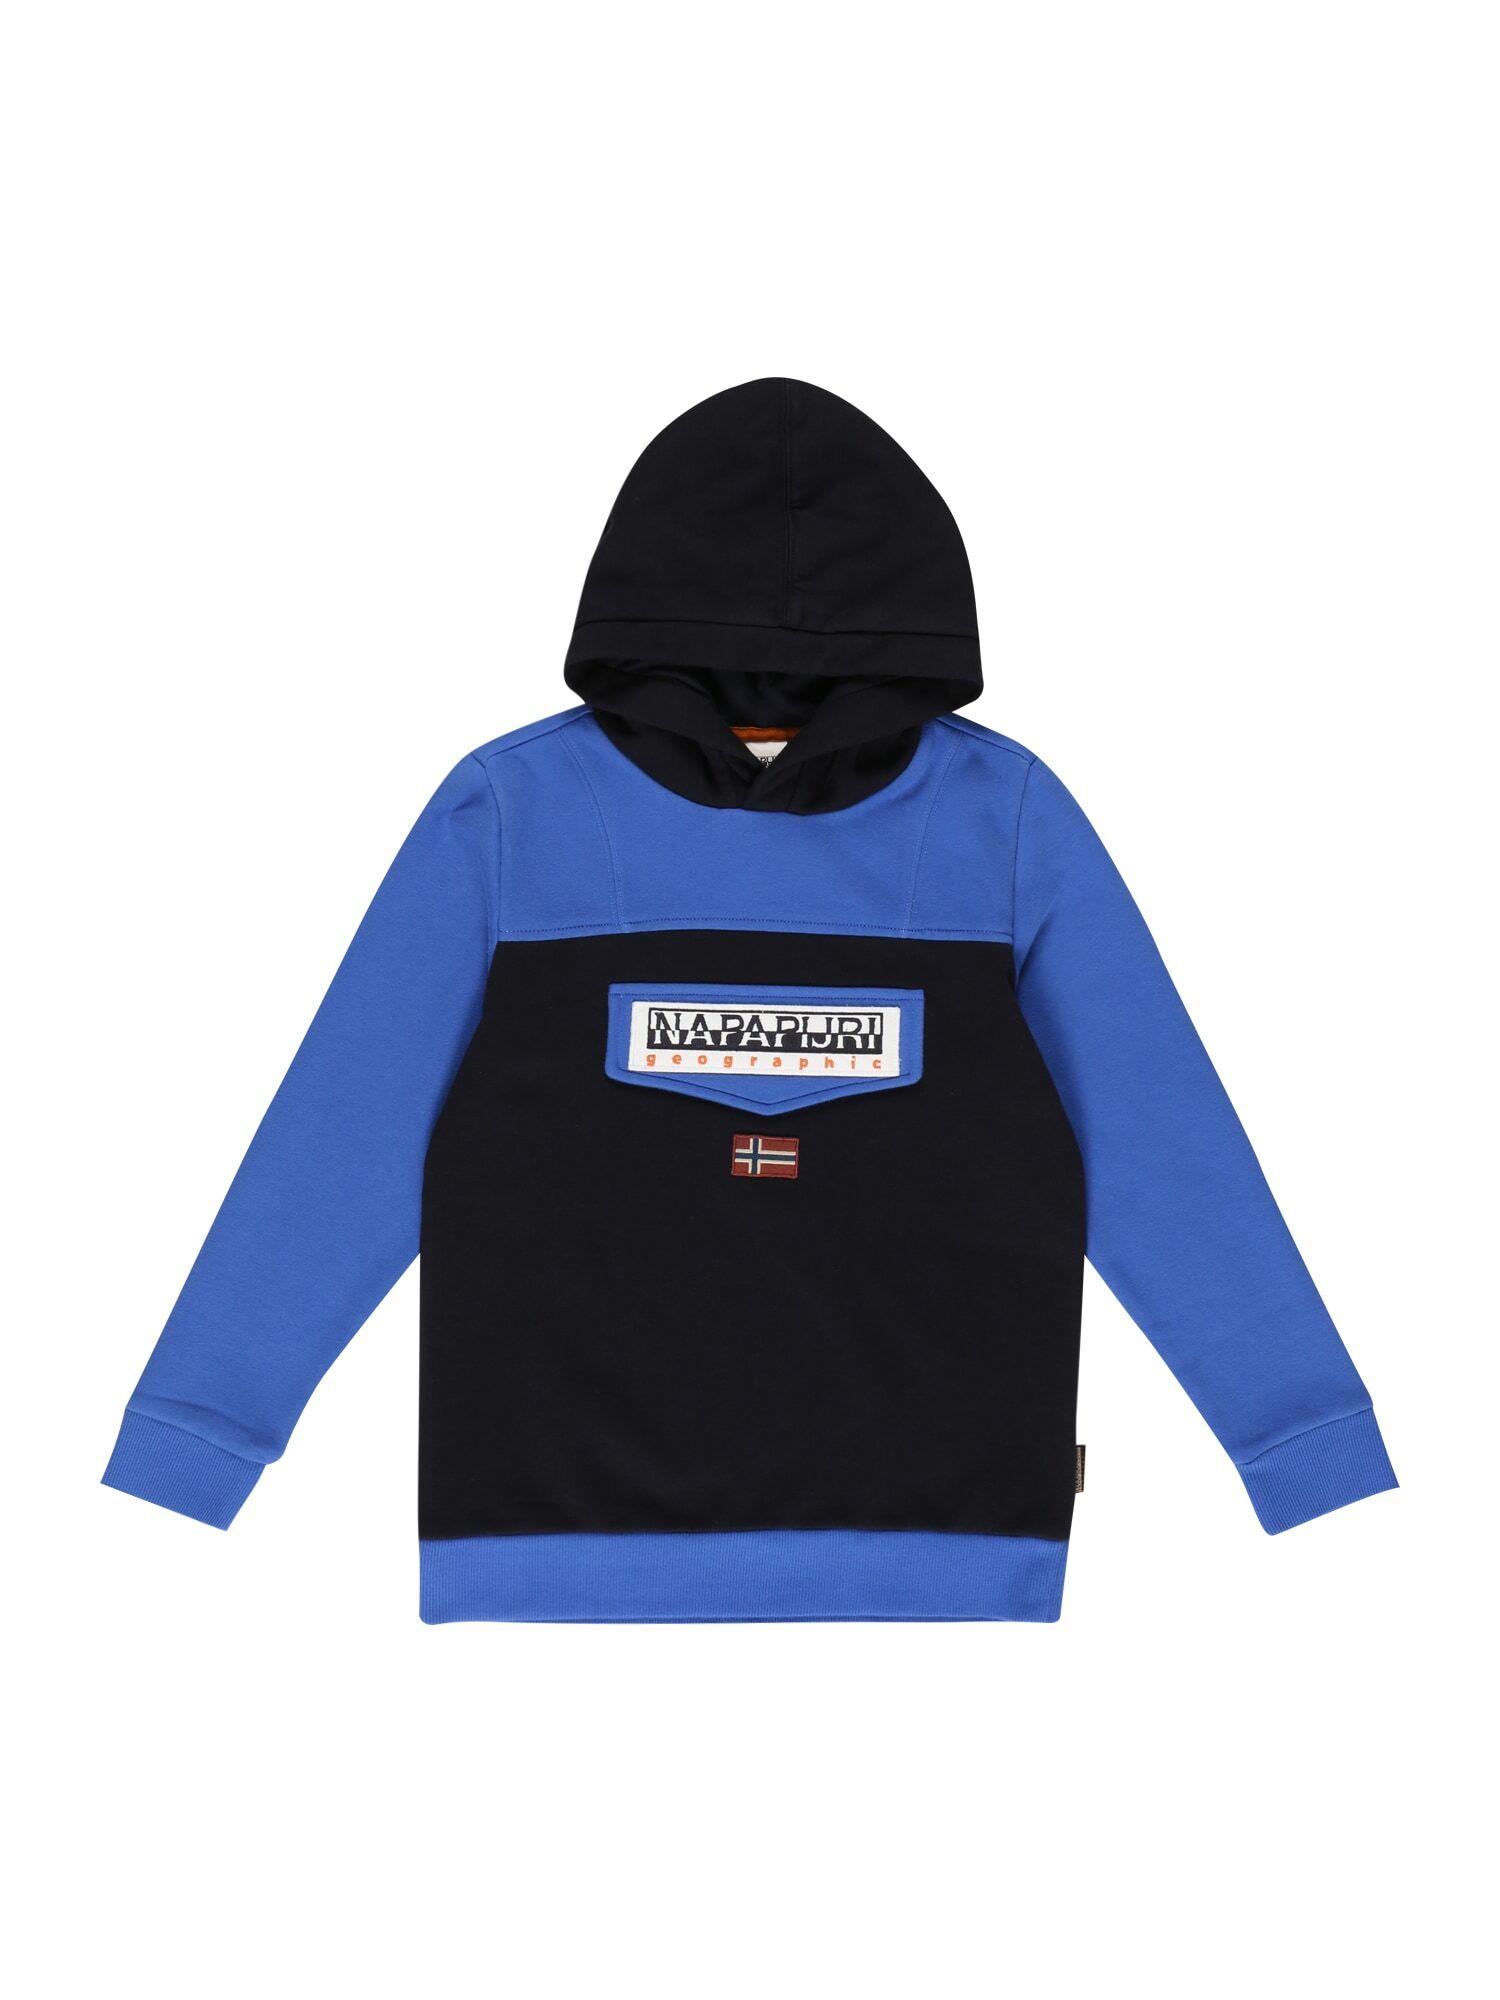 NAPAPIJRI Sweat-shirt 'BURGEE'  - Bleu - Taille: 8 - girl